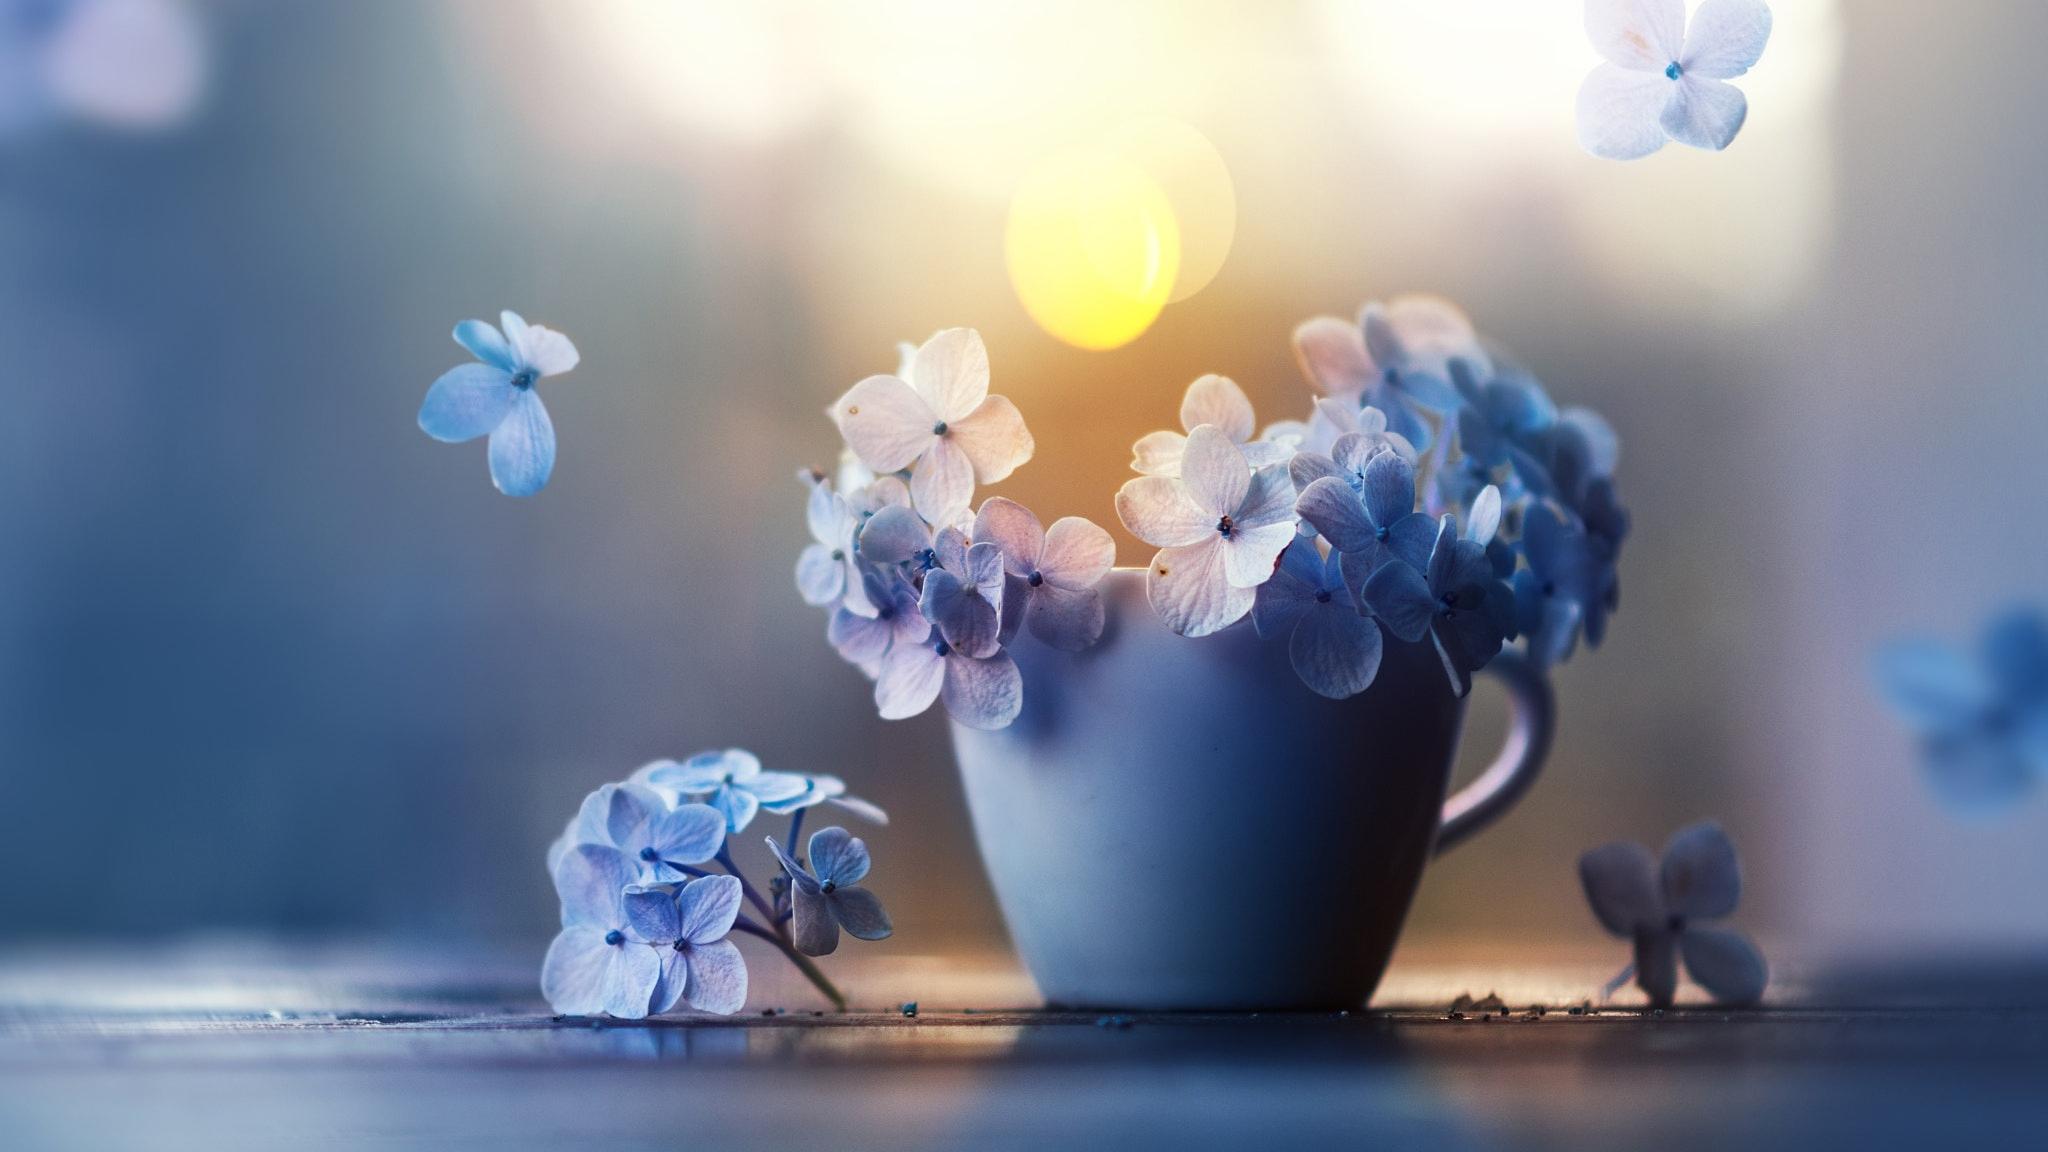 Download 2048x1152 wallpaper small blue flowers pot dual wide 2048x1152 wallpaper small blue flowers pot izmirmasajfo